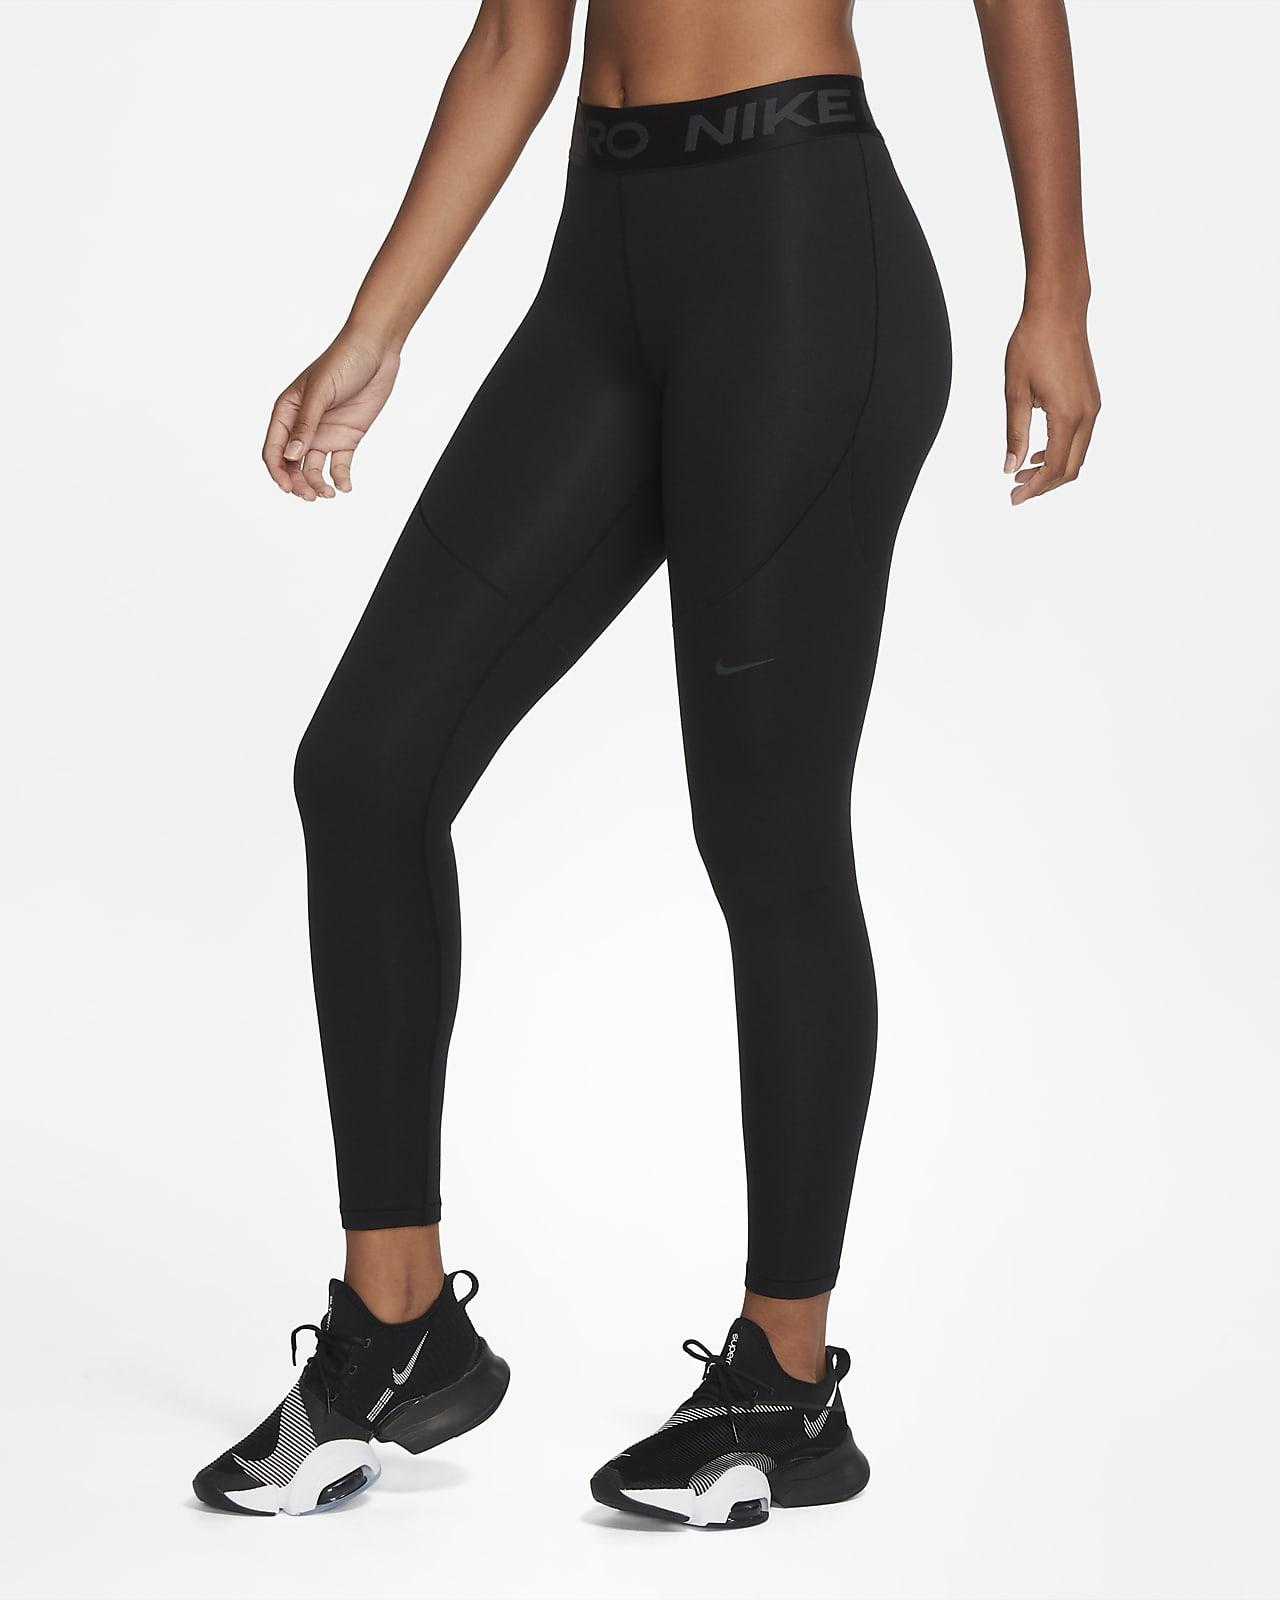 Nike Pro Therma Malles - Dona